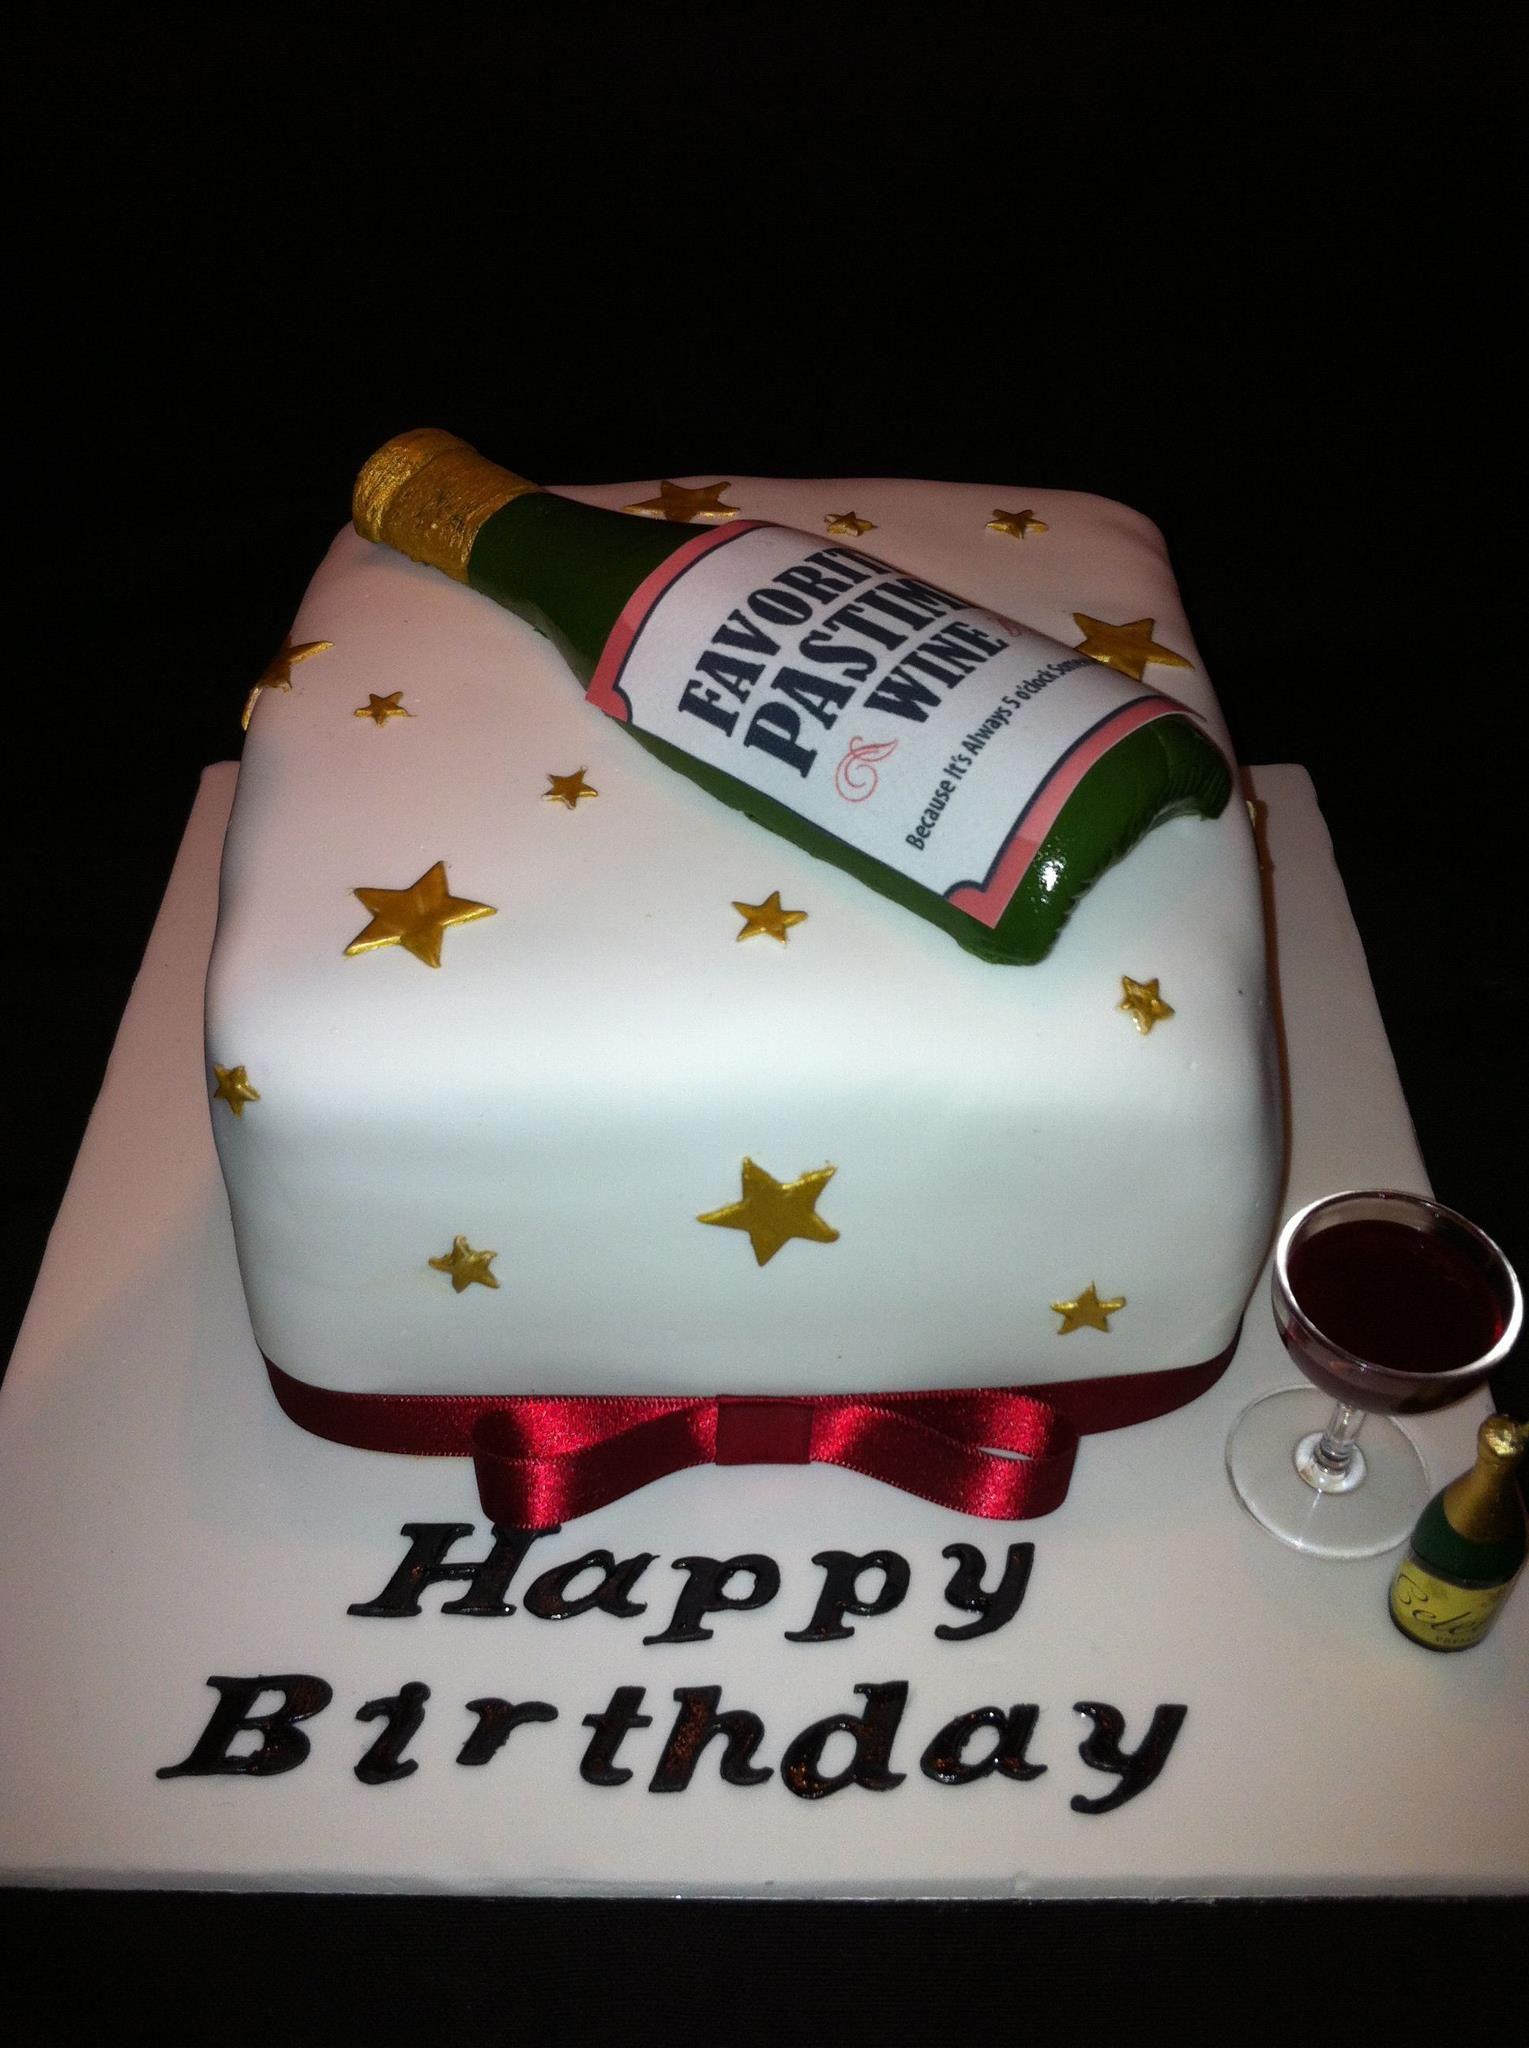 Amazing Pin By Noelia On Cakes With Images Wine Cake Birthday Cake Funny Birthday Cards Online Ioscodamsfinfo